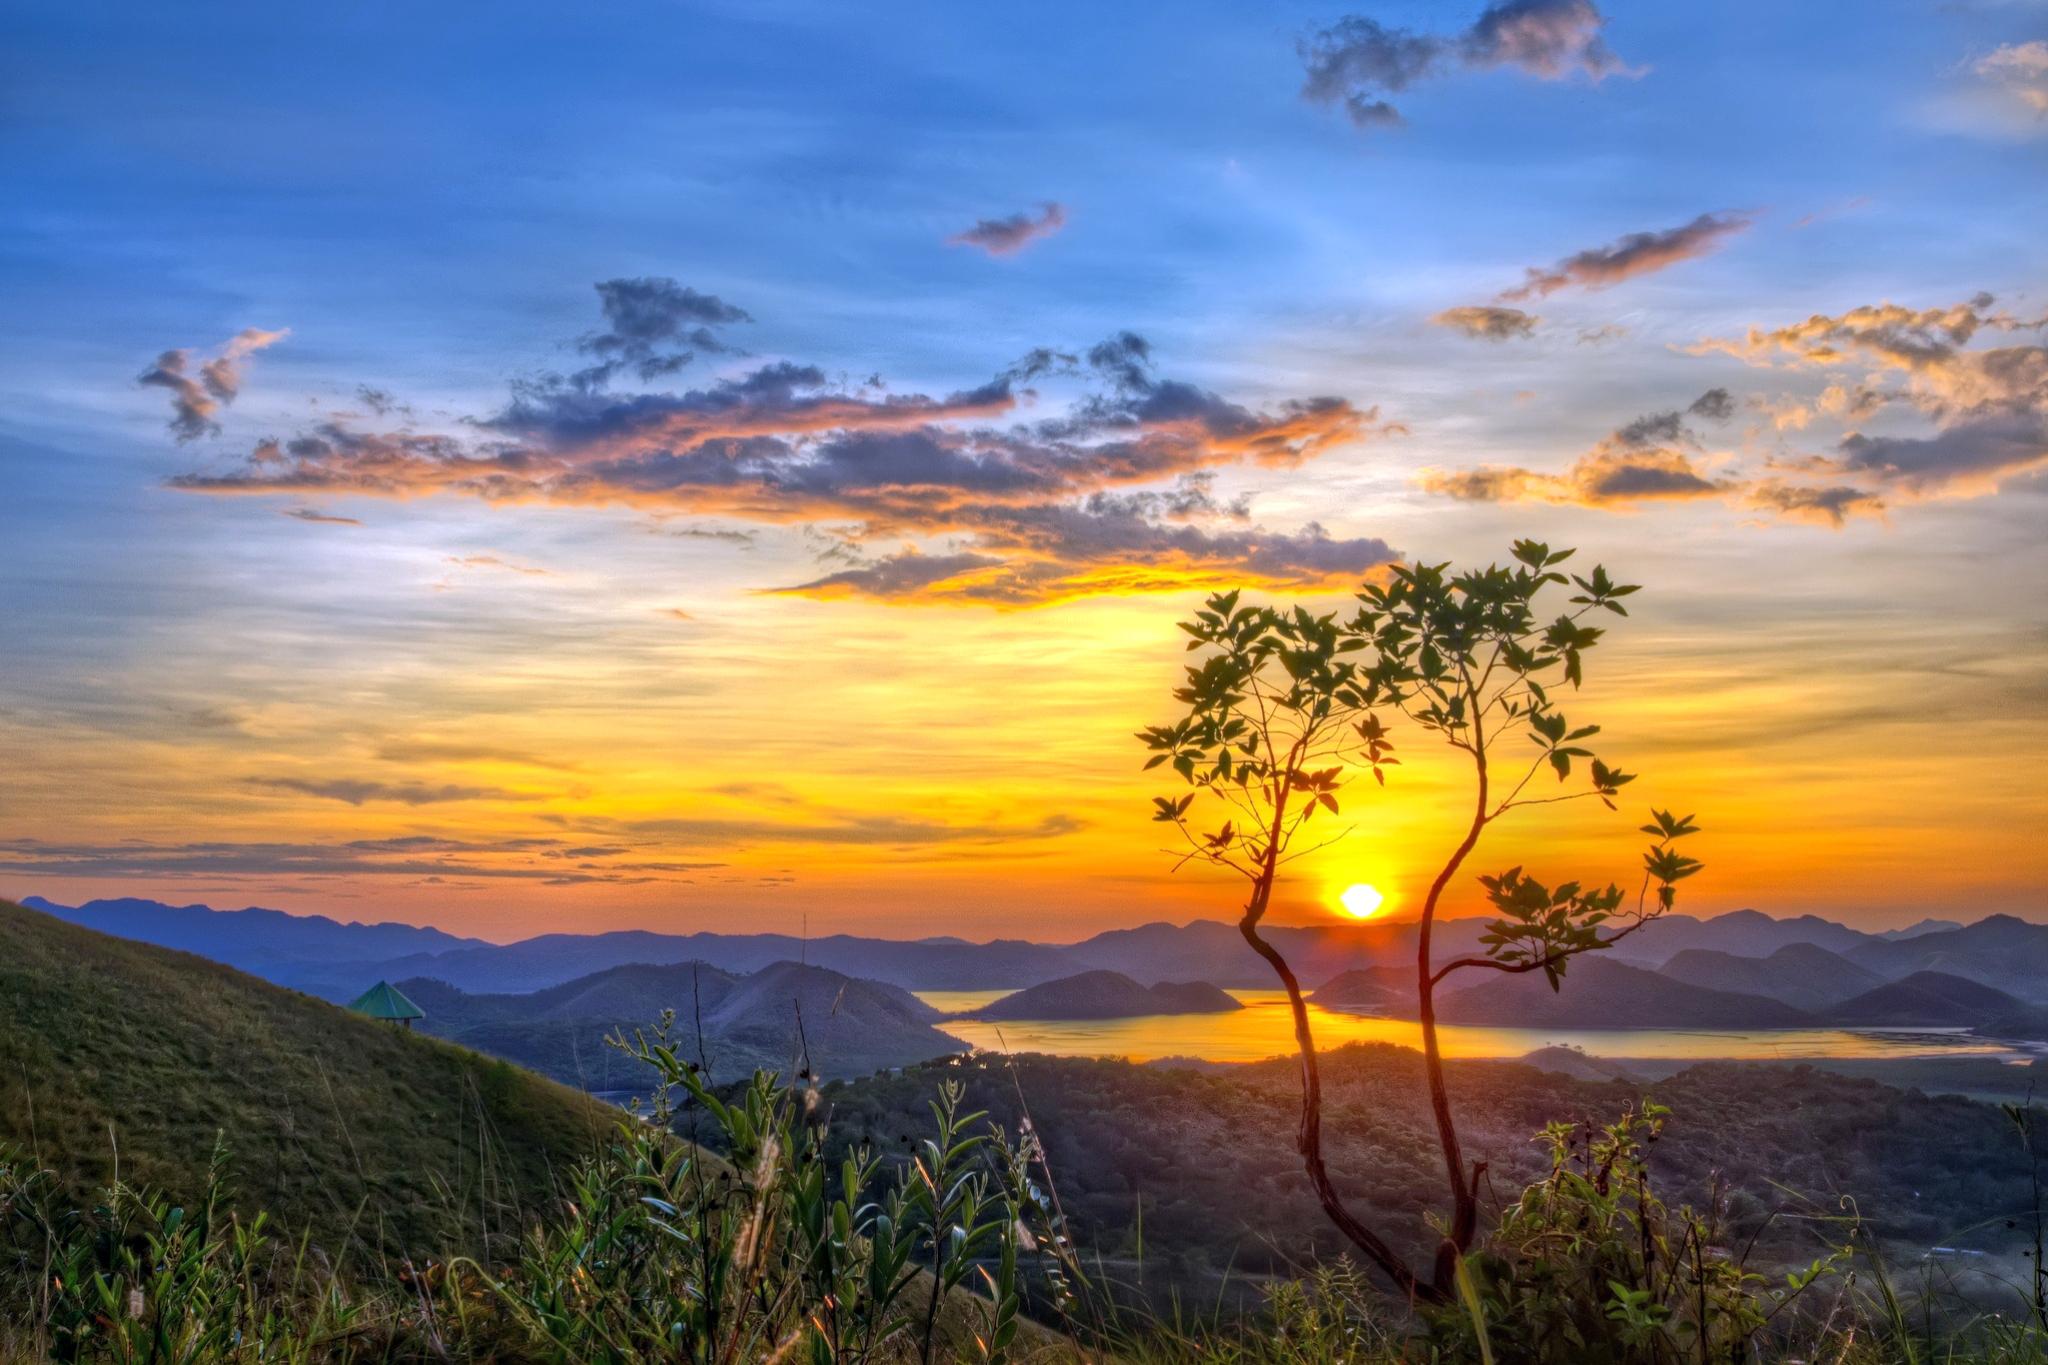 обои горы, озеро, закат, природа картинки фото